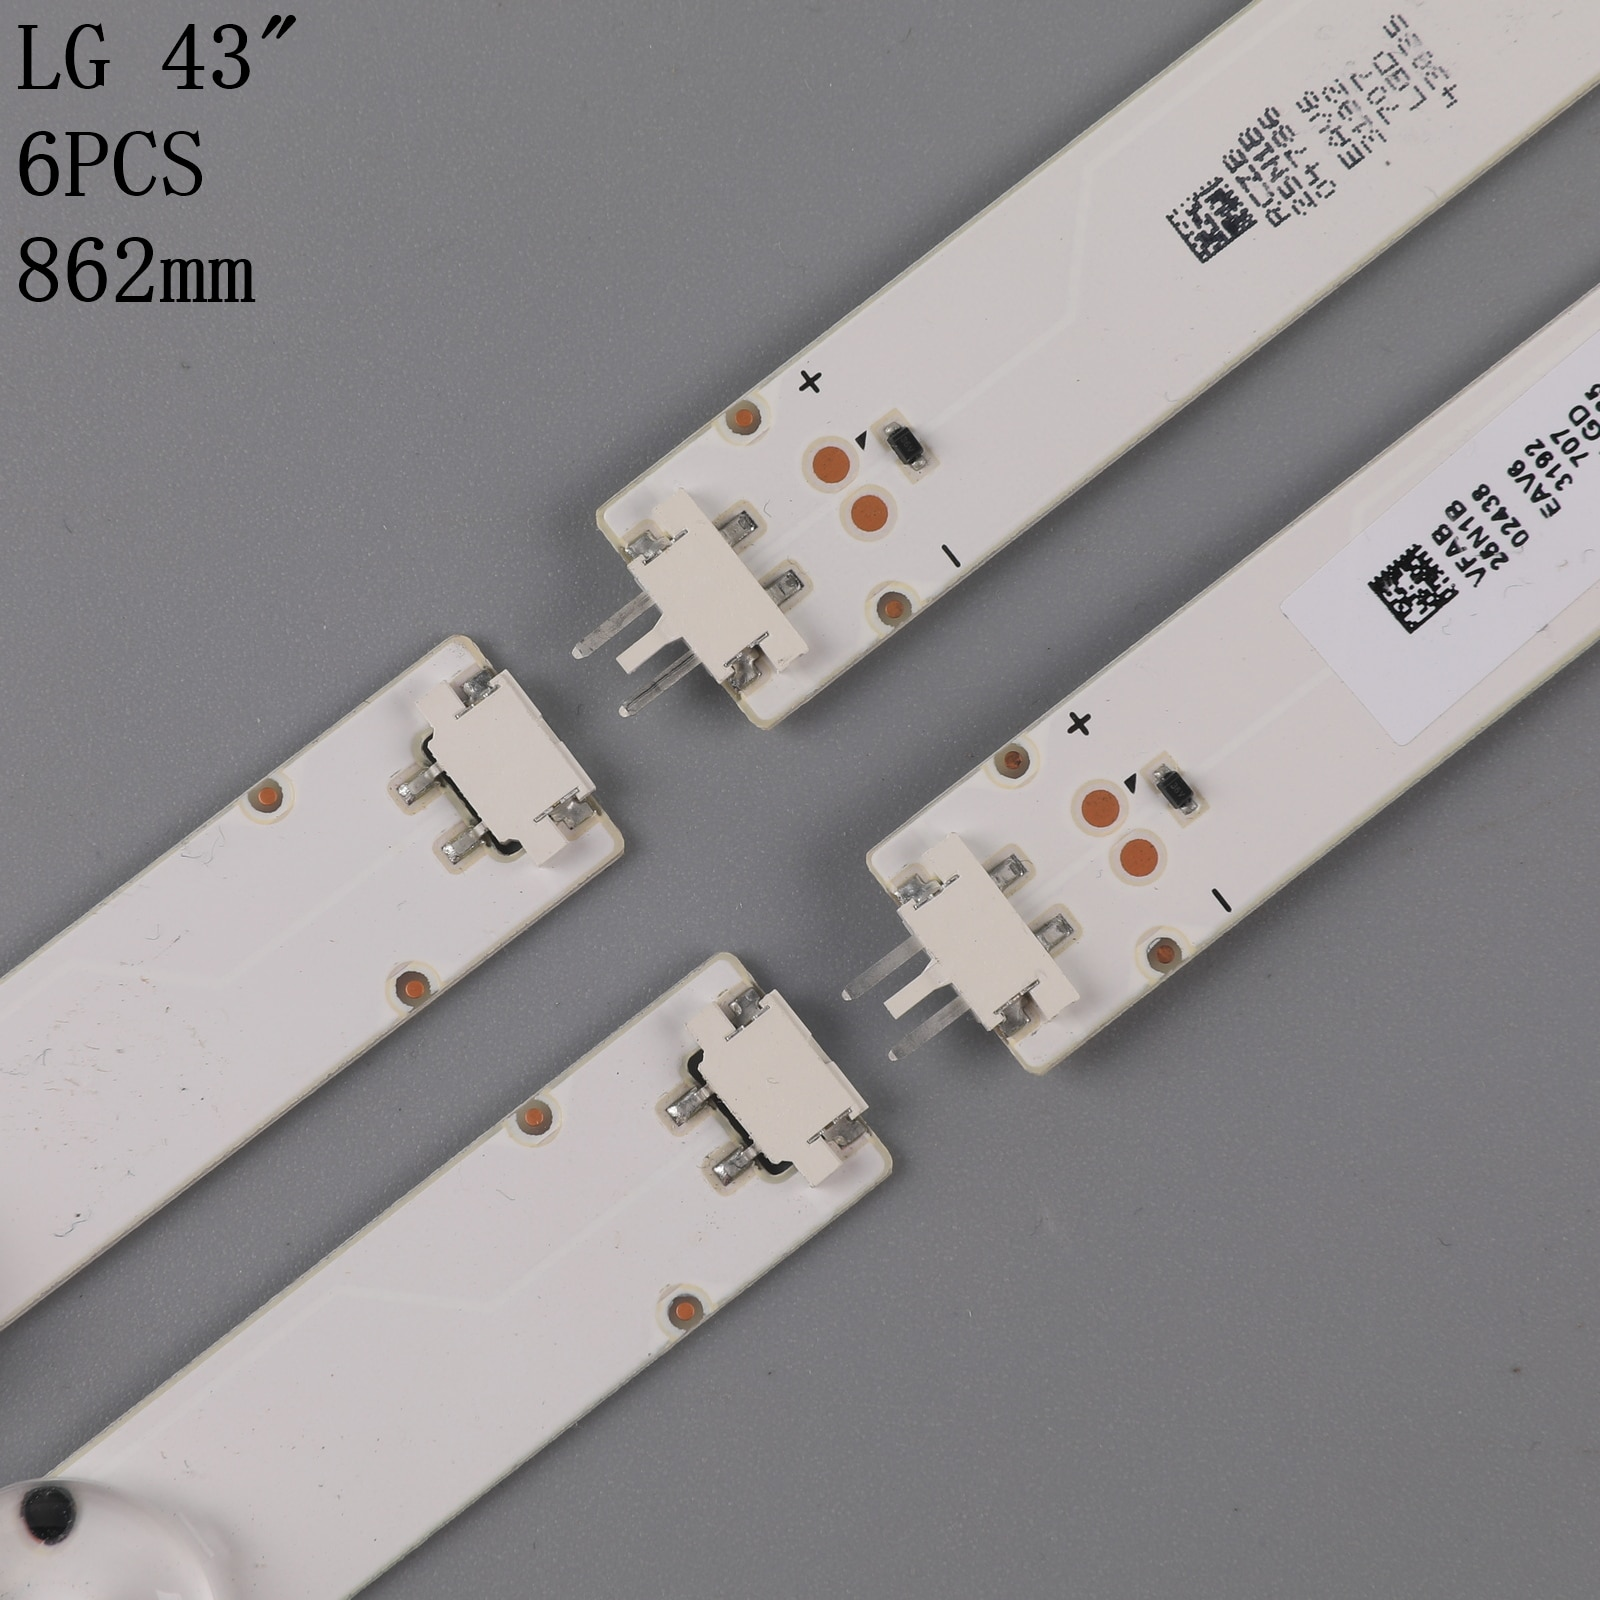 Led hintergrundbeleuchtung Streifen Für LG 43LH511T 43LH513V 43LH5150 LED Bars Band Herrscher 43LH51_FHD_A S LGE_WICOP_FHD SSC_43inch_FHD_B_REV02 Blitz-Teile    -